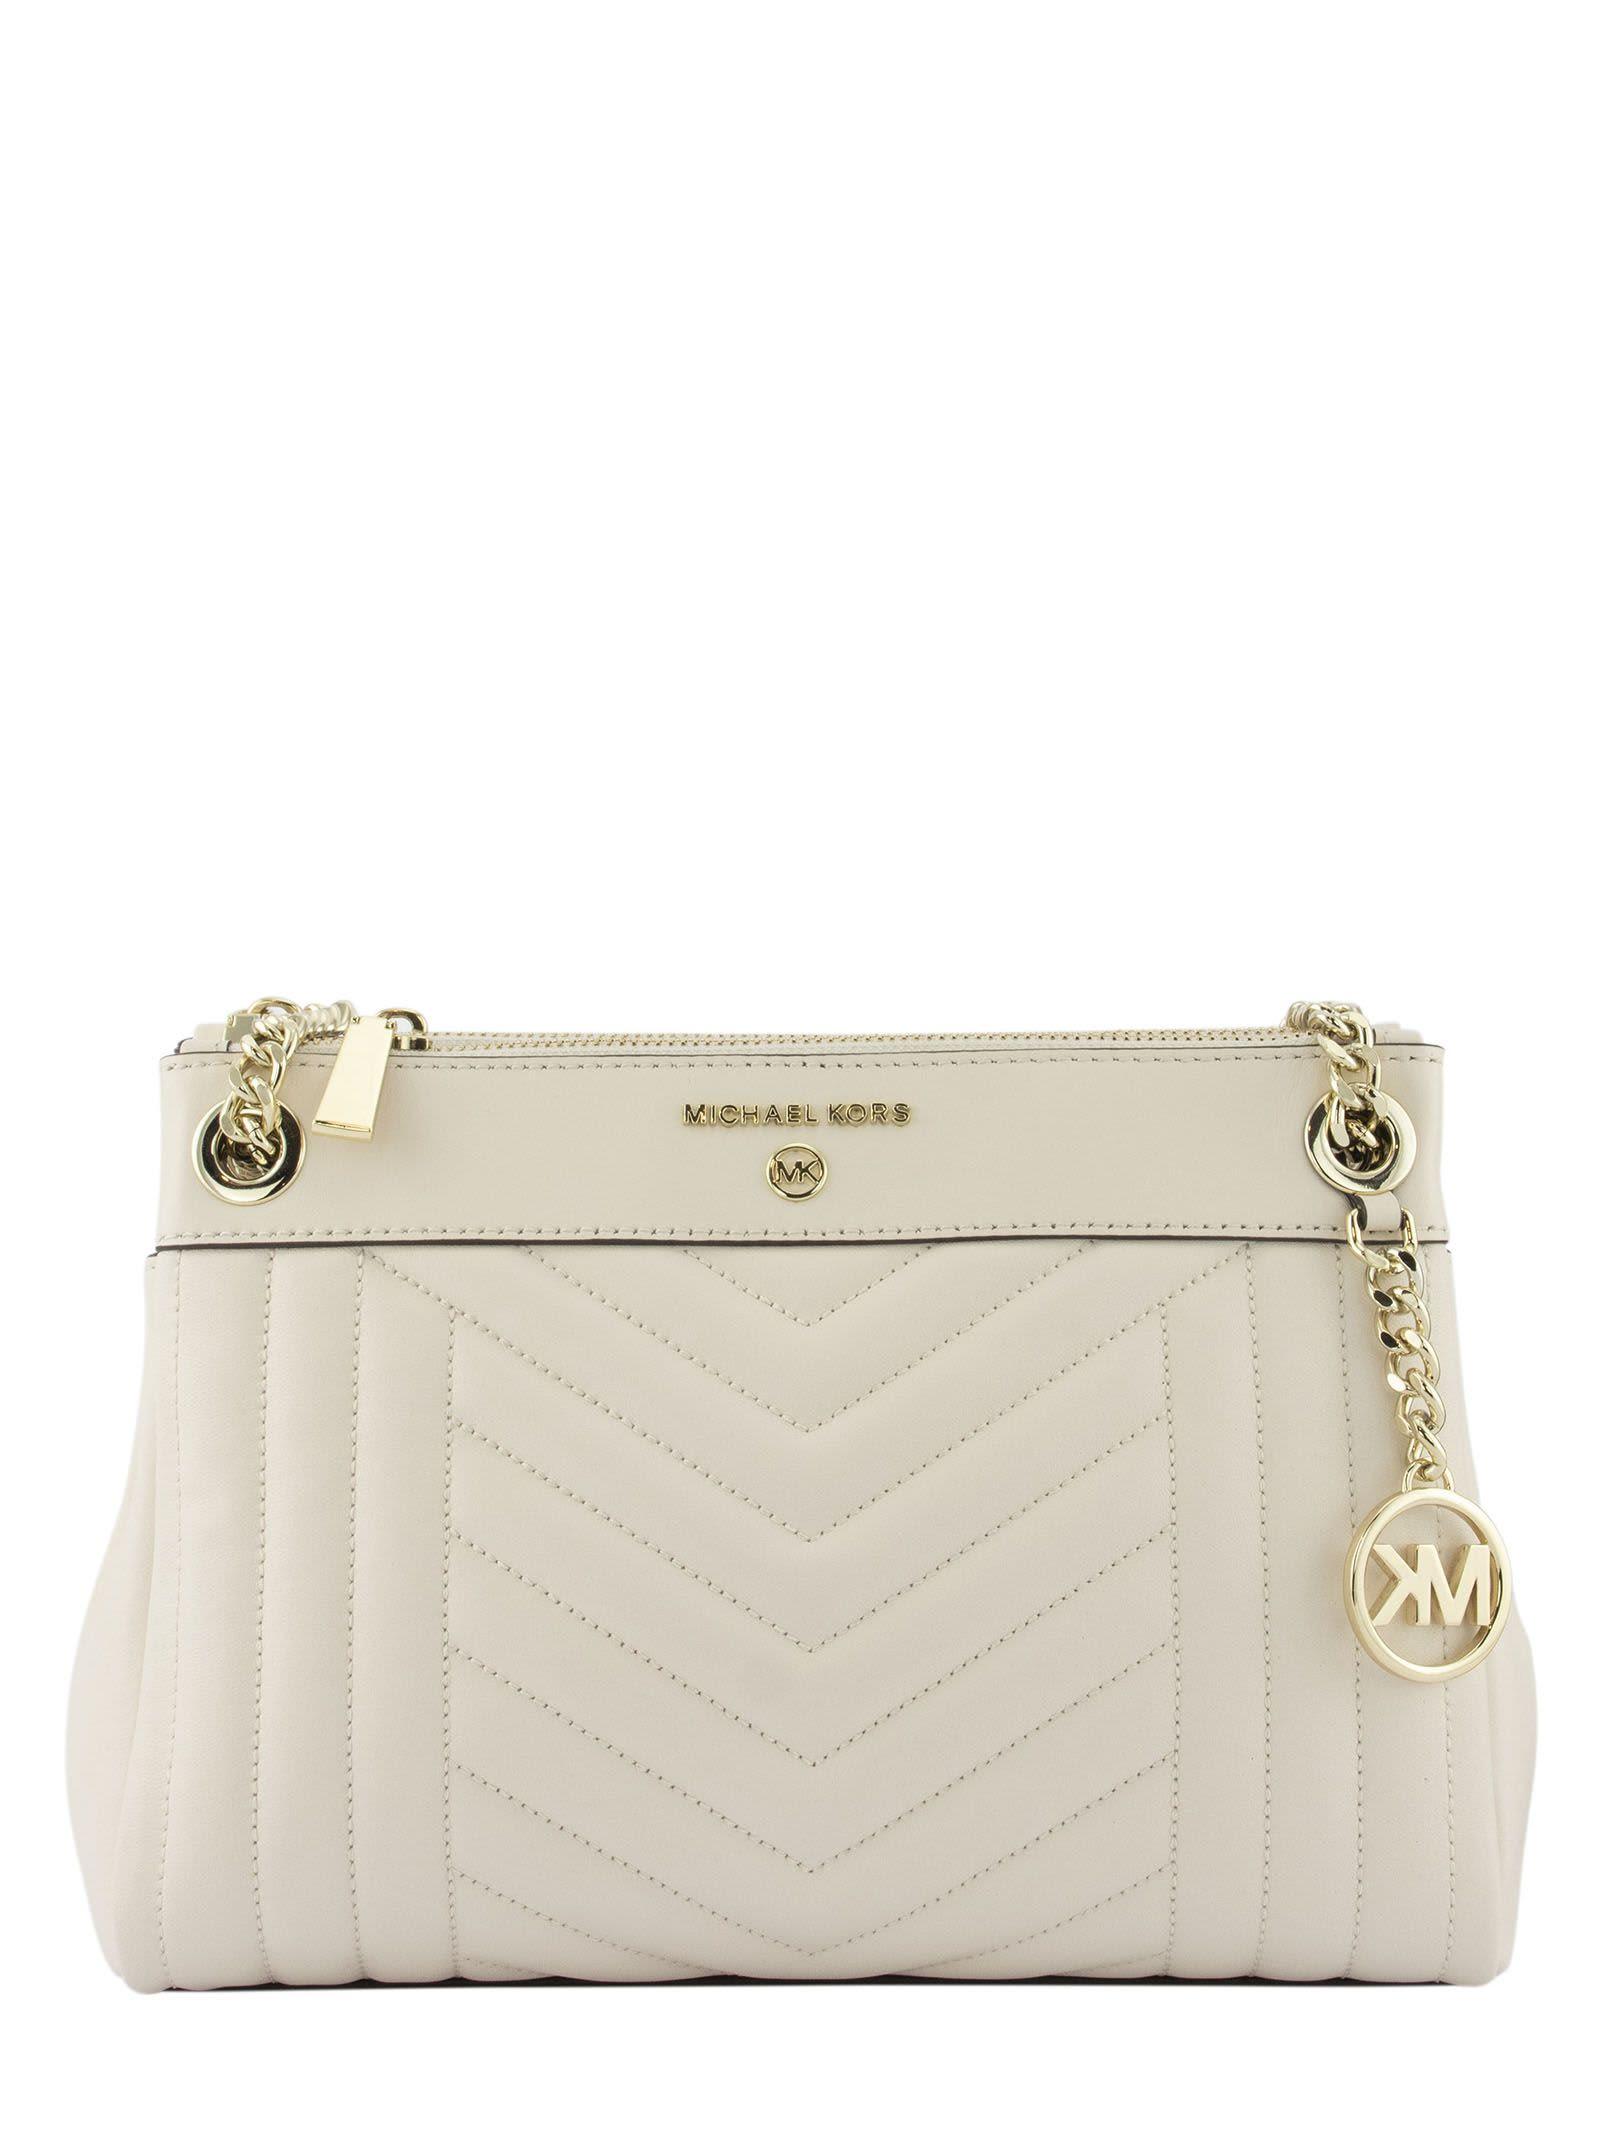 Michael Kors Susan Small Shoulder Bag Cream